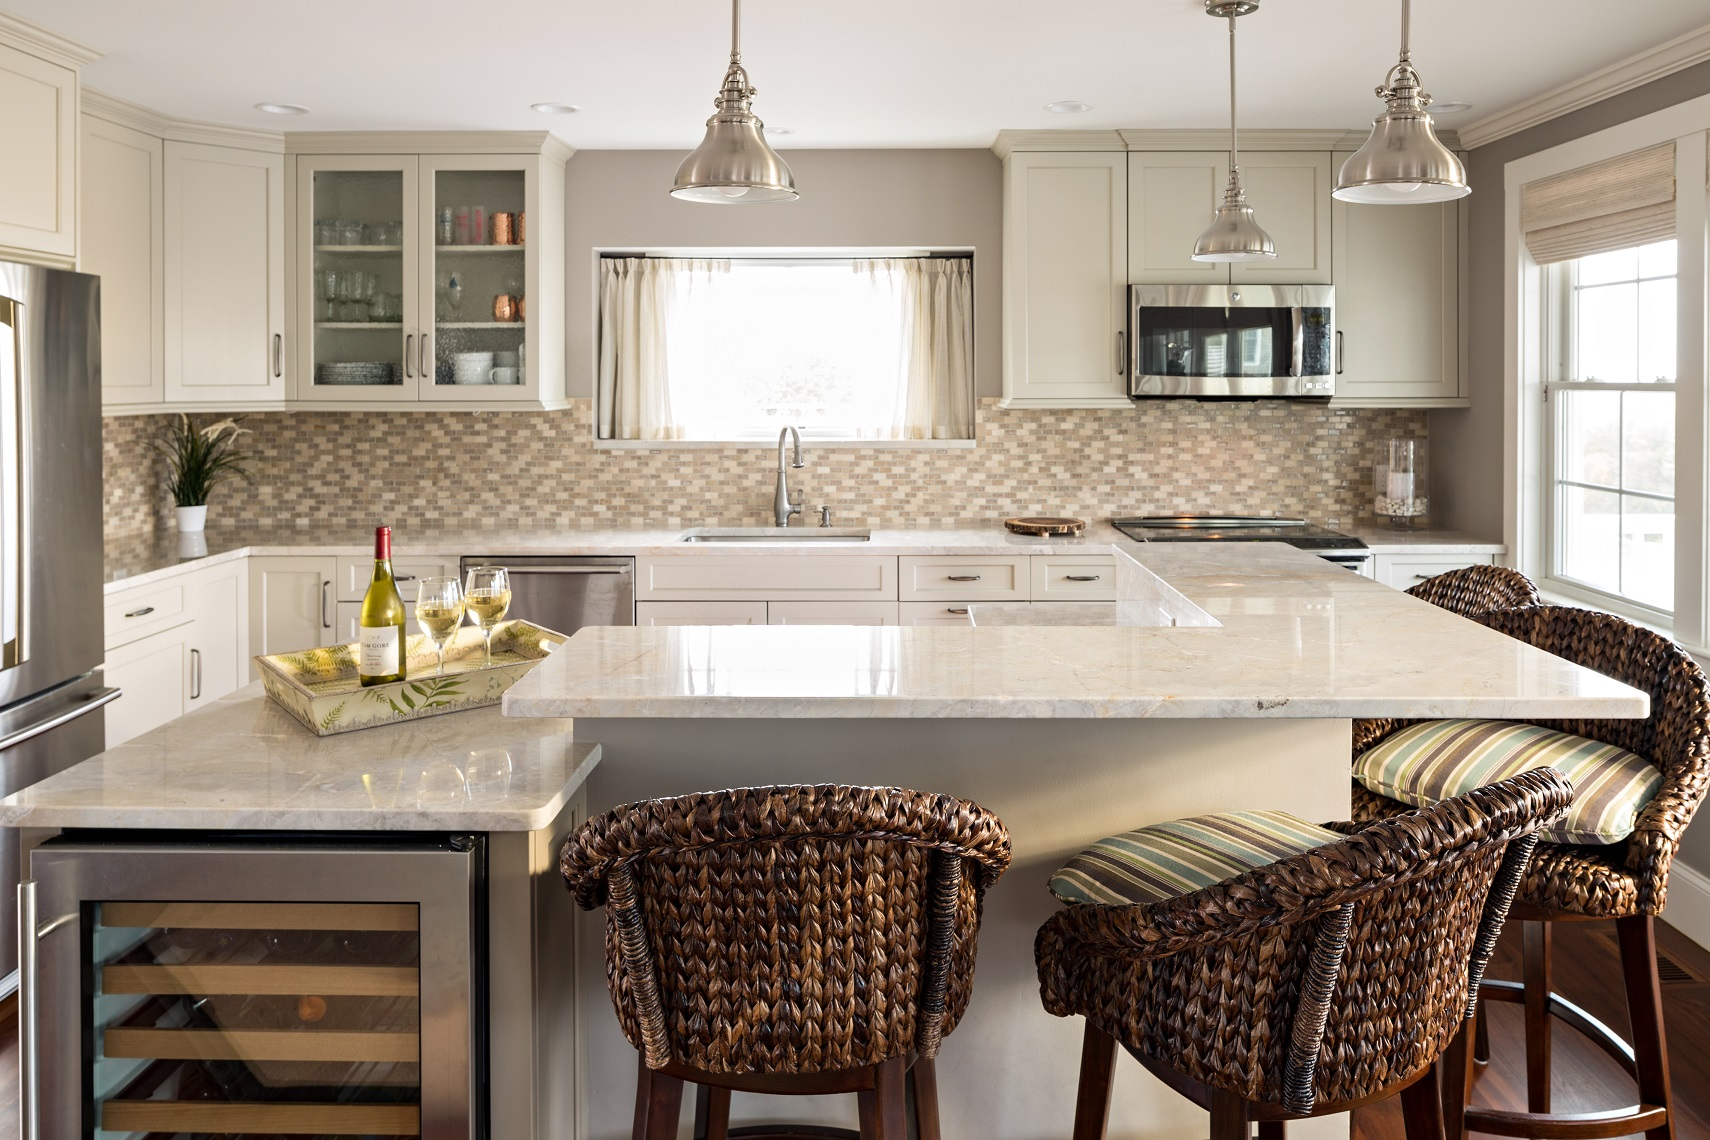 Northside_Bayview_Cape_kitchen_counter_web.jpg